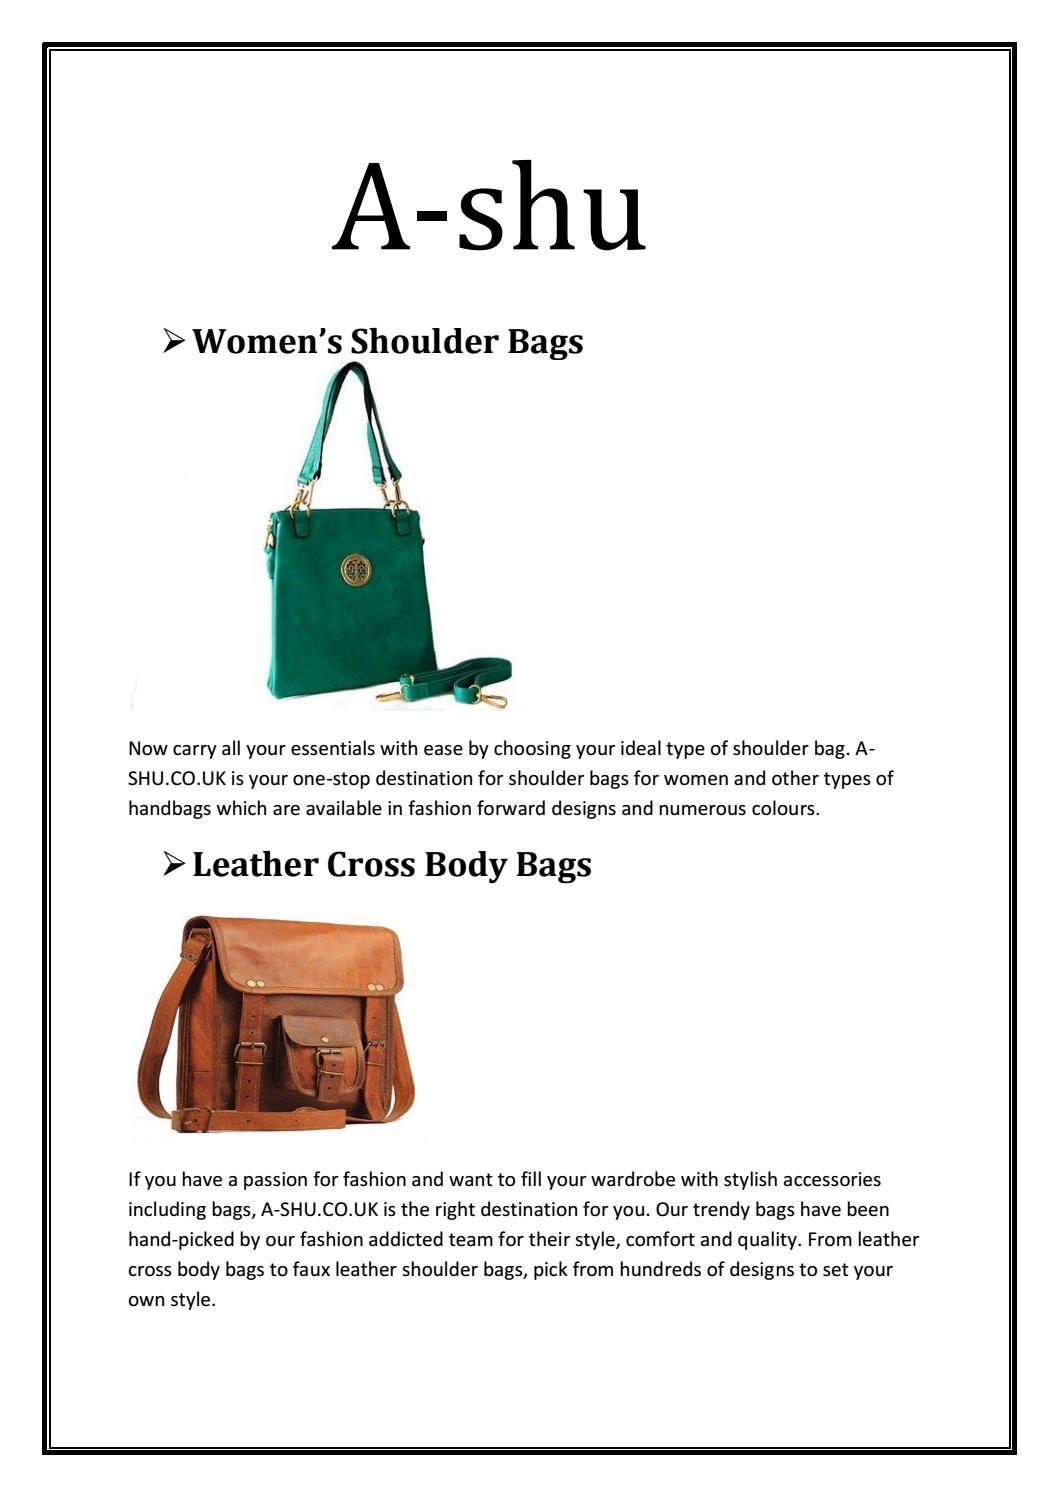 07537981294 Buy Ladies Purse & Handbags Online in UK by a.shu.co.uk - issuu